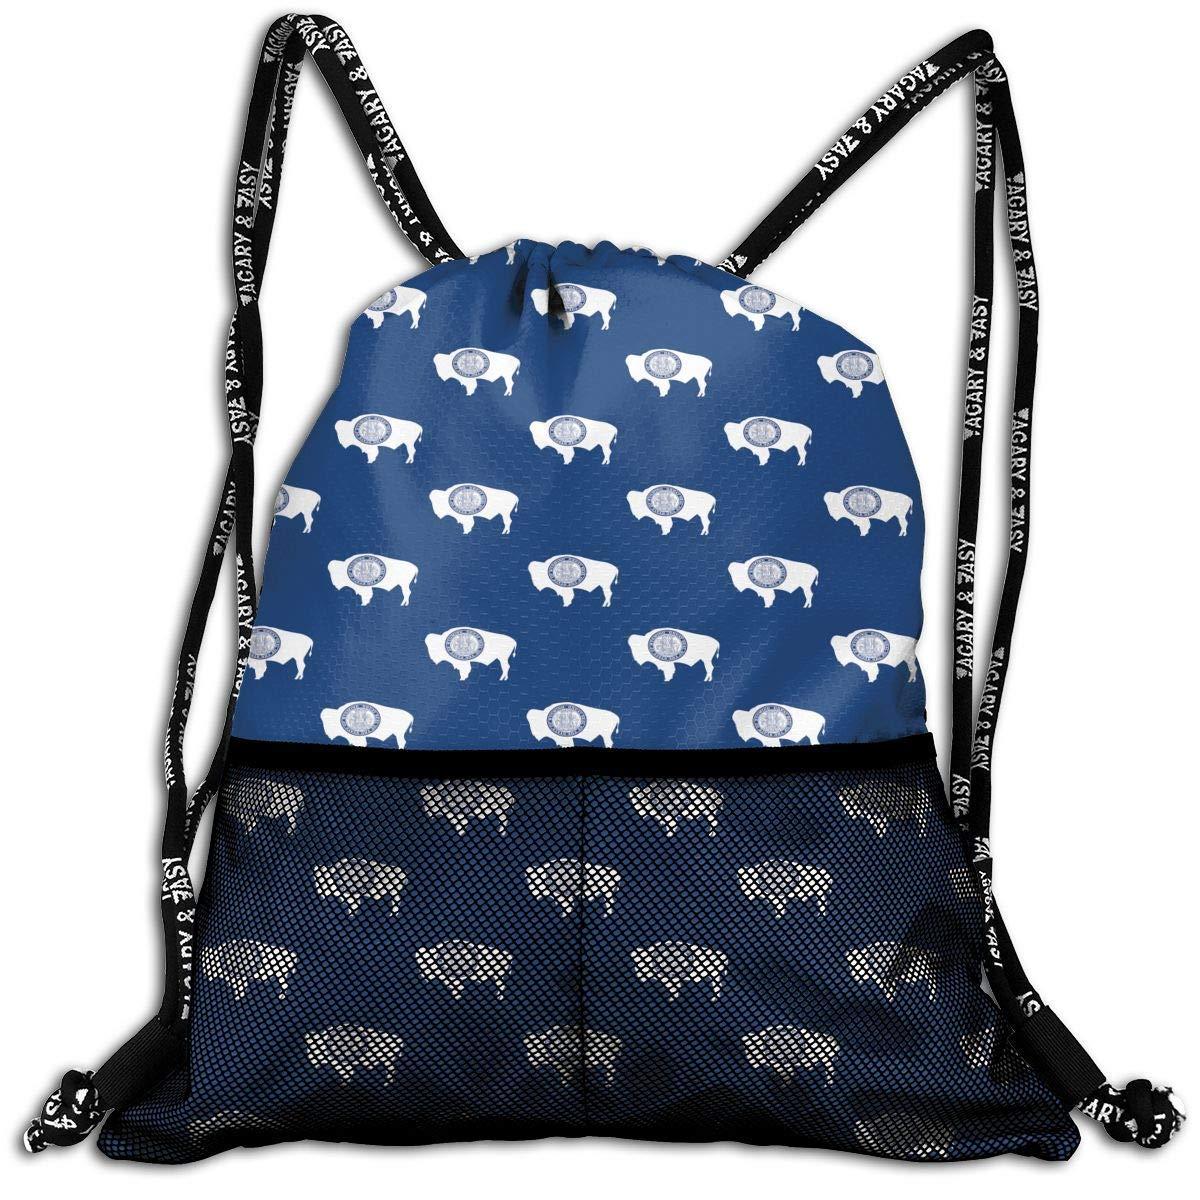 Hipiyoled Wyoming State Flag Pattern Durable Sport Drawstring Backpack for School Soccer Yoga